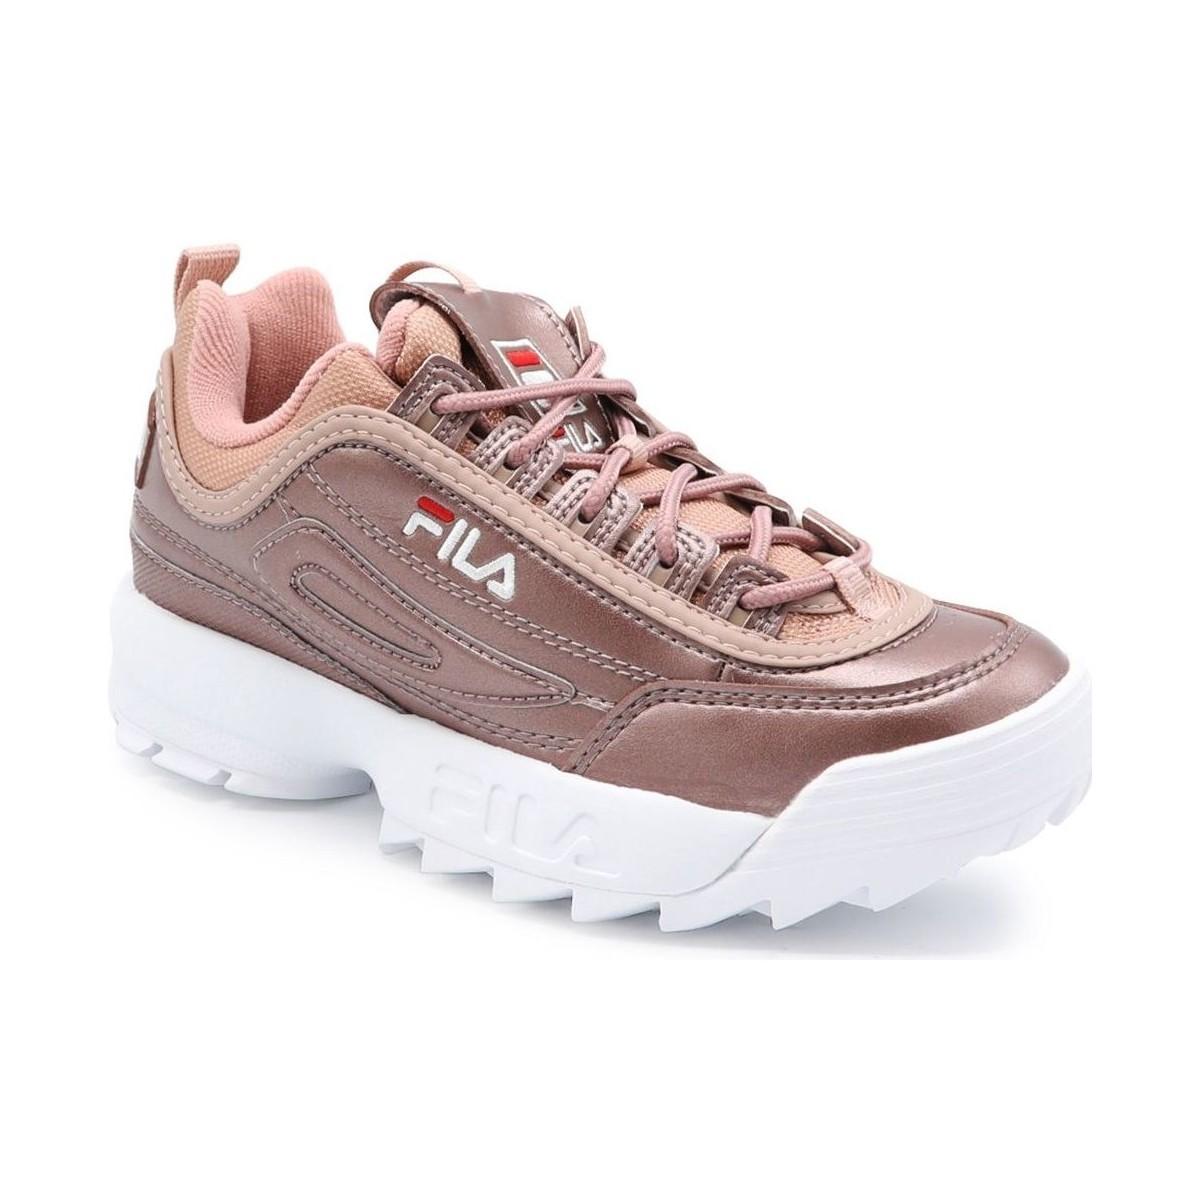 Wmn Sneaker Ash Femme Rose Cuir M Fila Chaussures Rosegold Low Disruptor qO0xdwqz